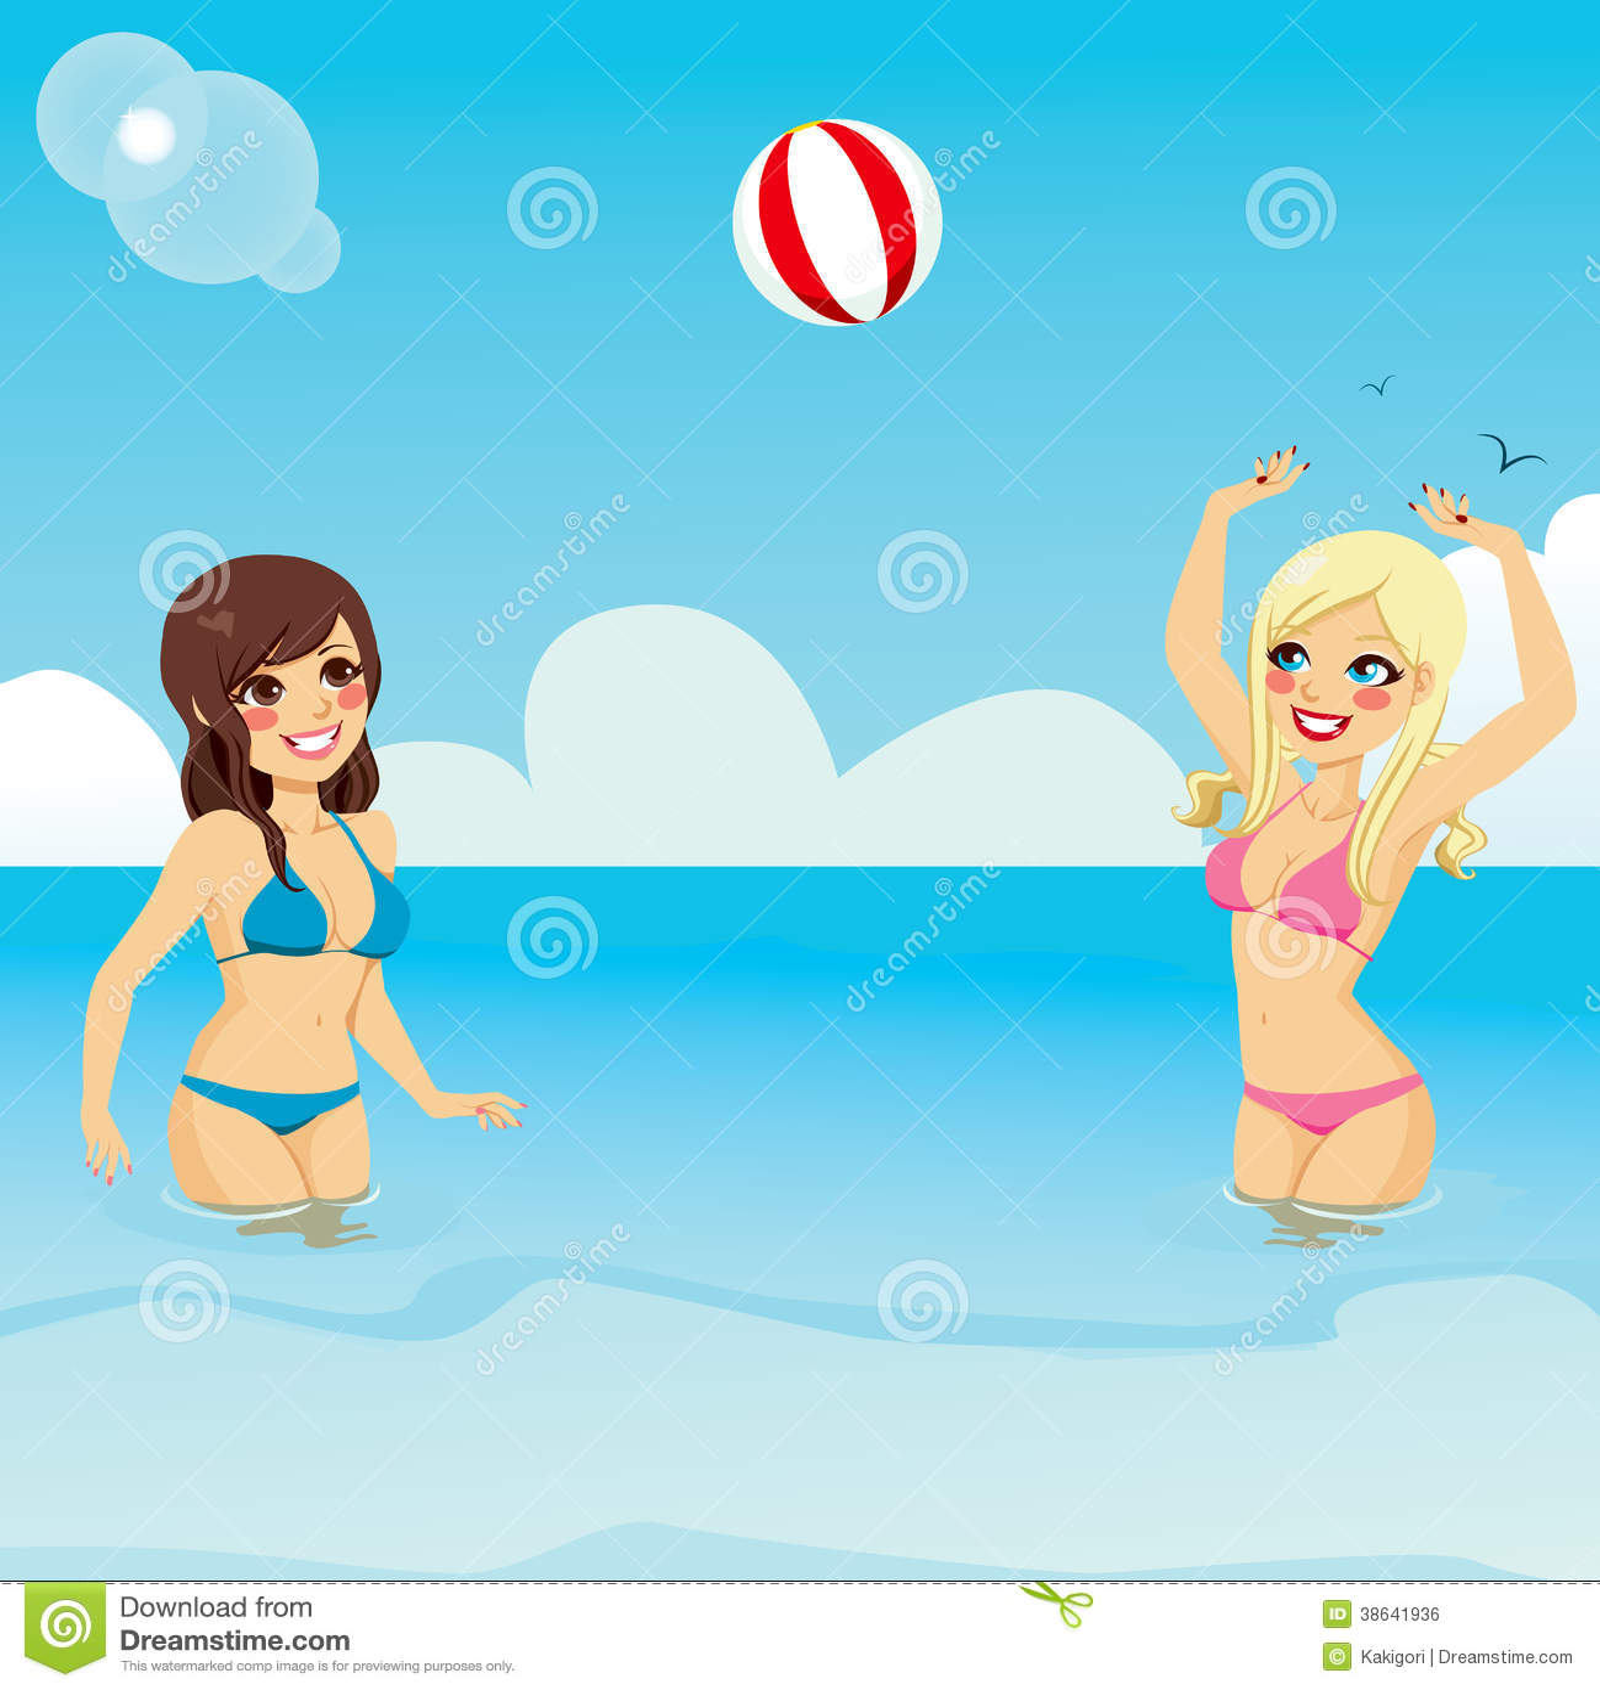 Woman With Beautiful Body In Bikini At Beach Stock Image: Girls Playing Beach Ball Stock Vector. Illustration Of